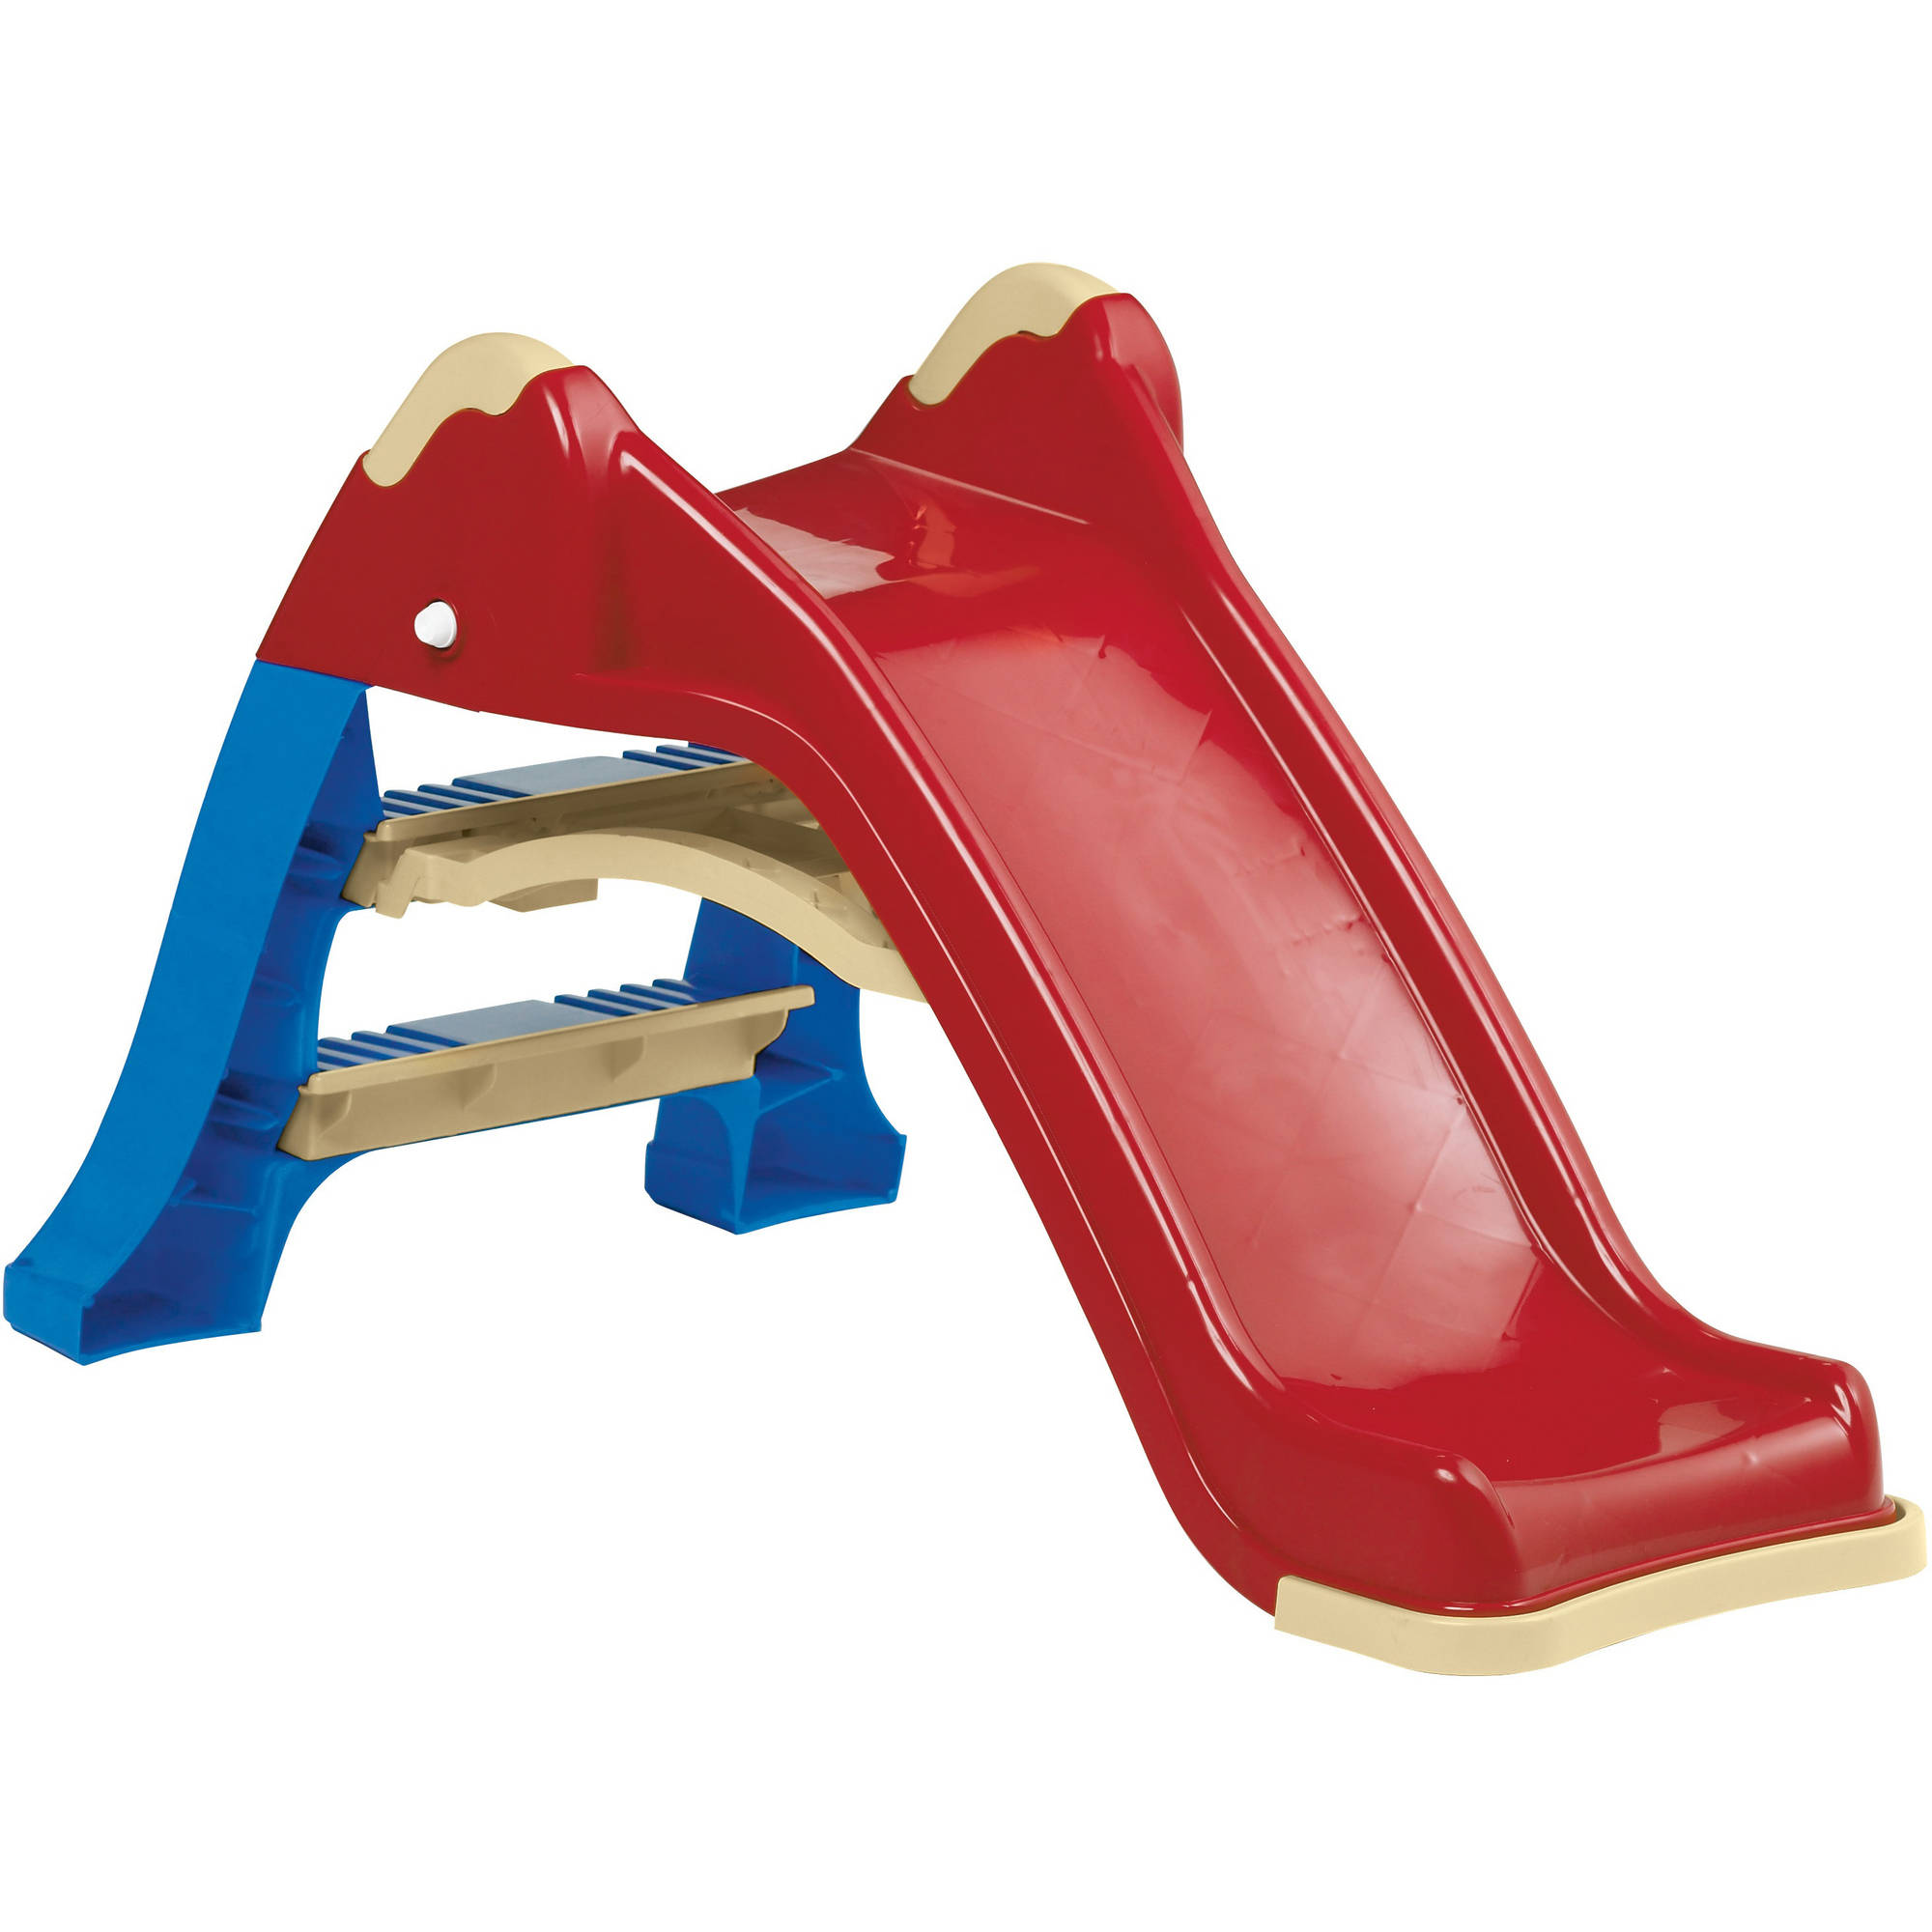 American Plastic Toys Indoor/ Outdoor Folding Slide